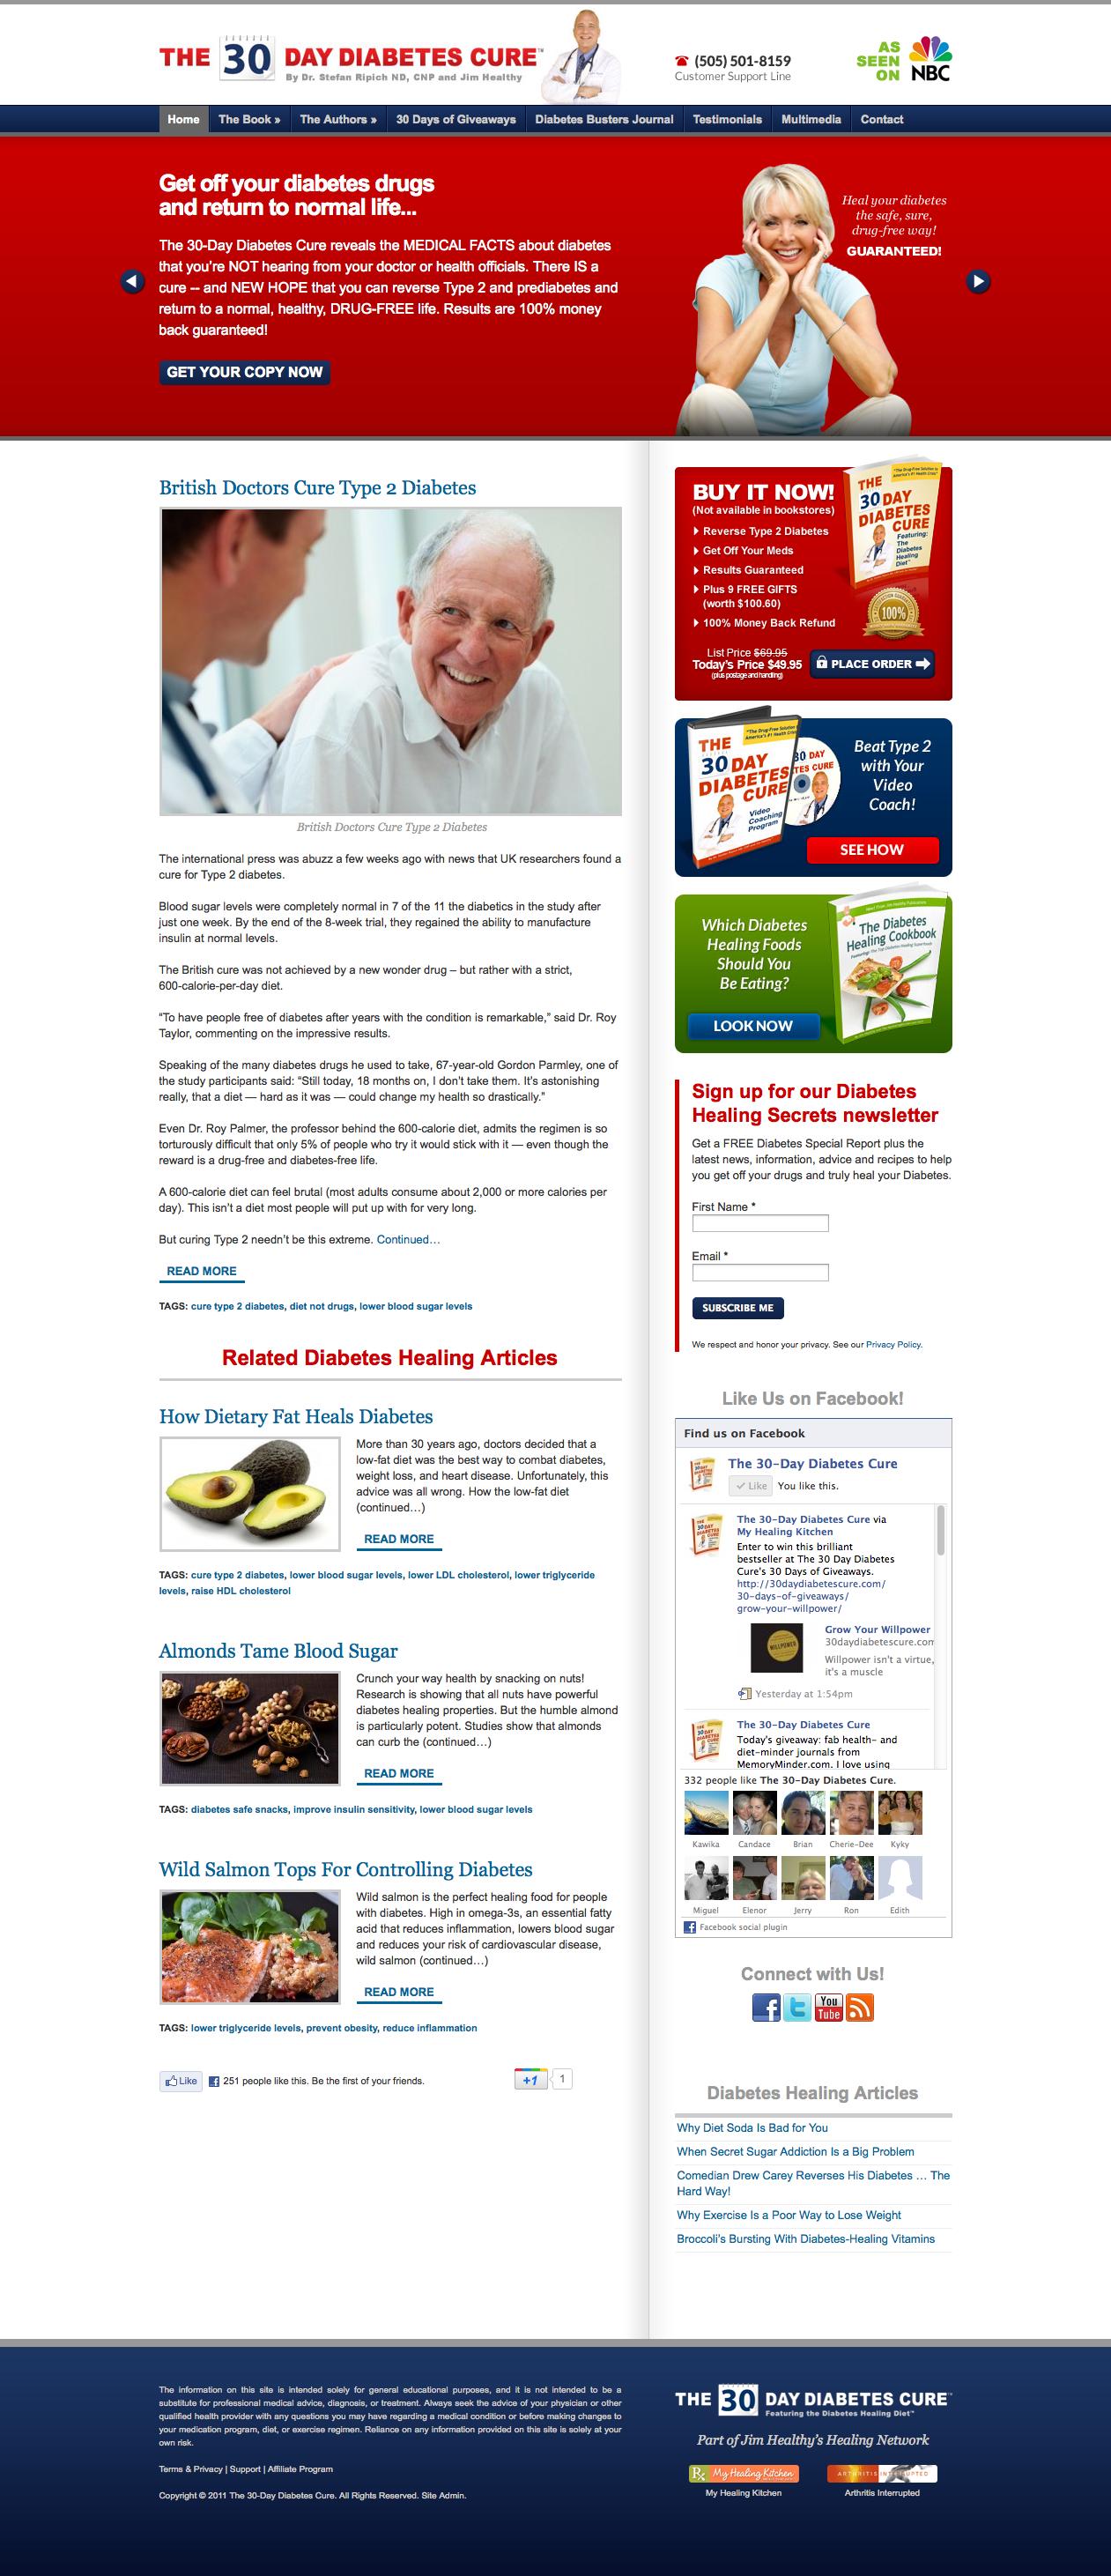 Amazon.com: The 30 Day Diabetes Cure eBook: Jim Healthy, Stefan Ripich:  Kindle Store